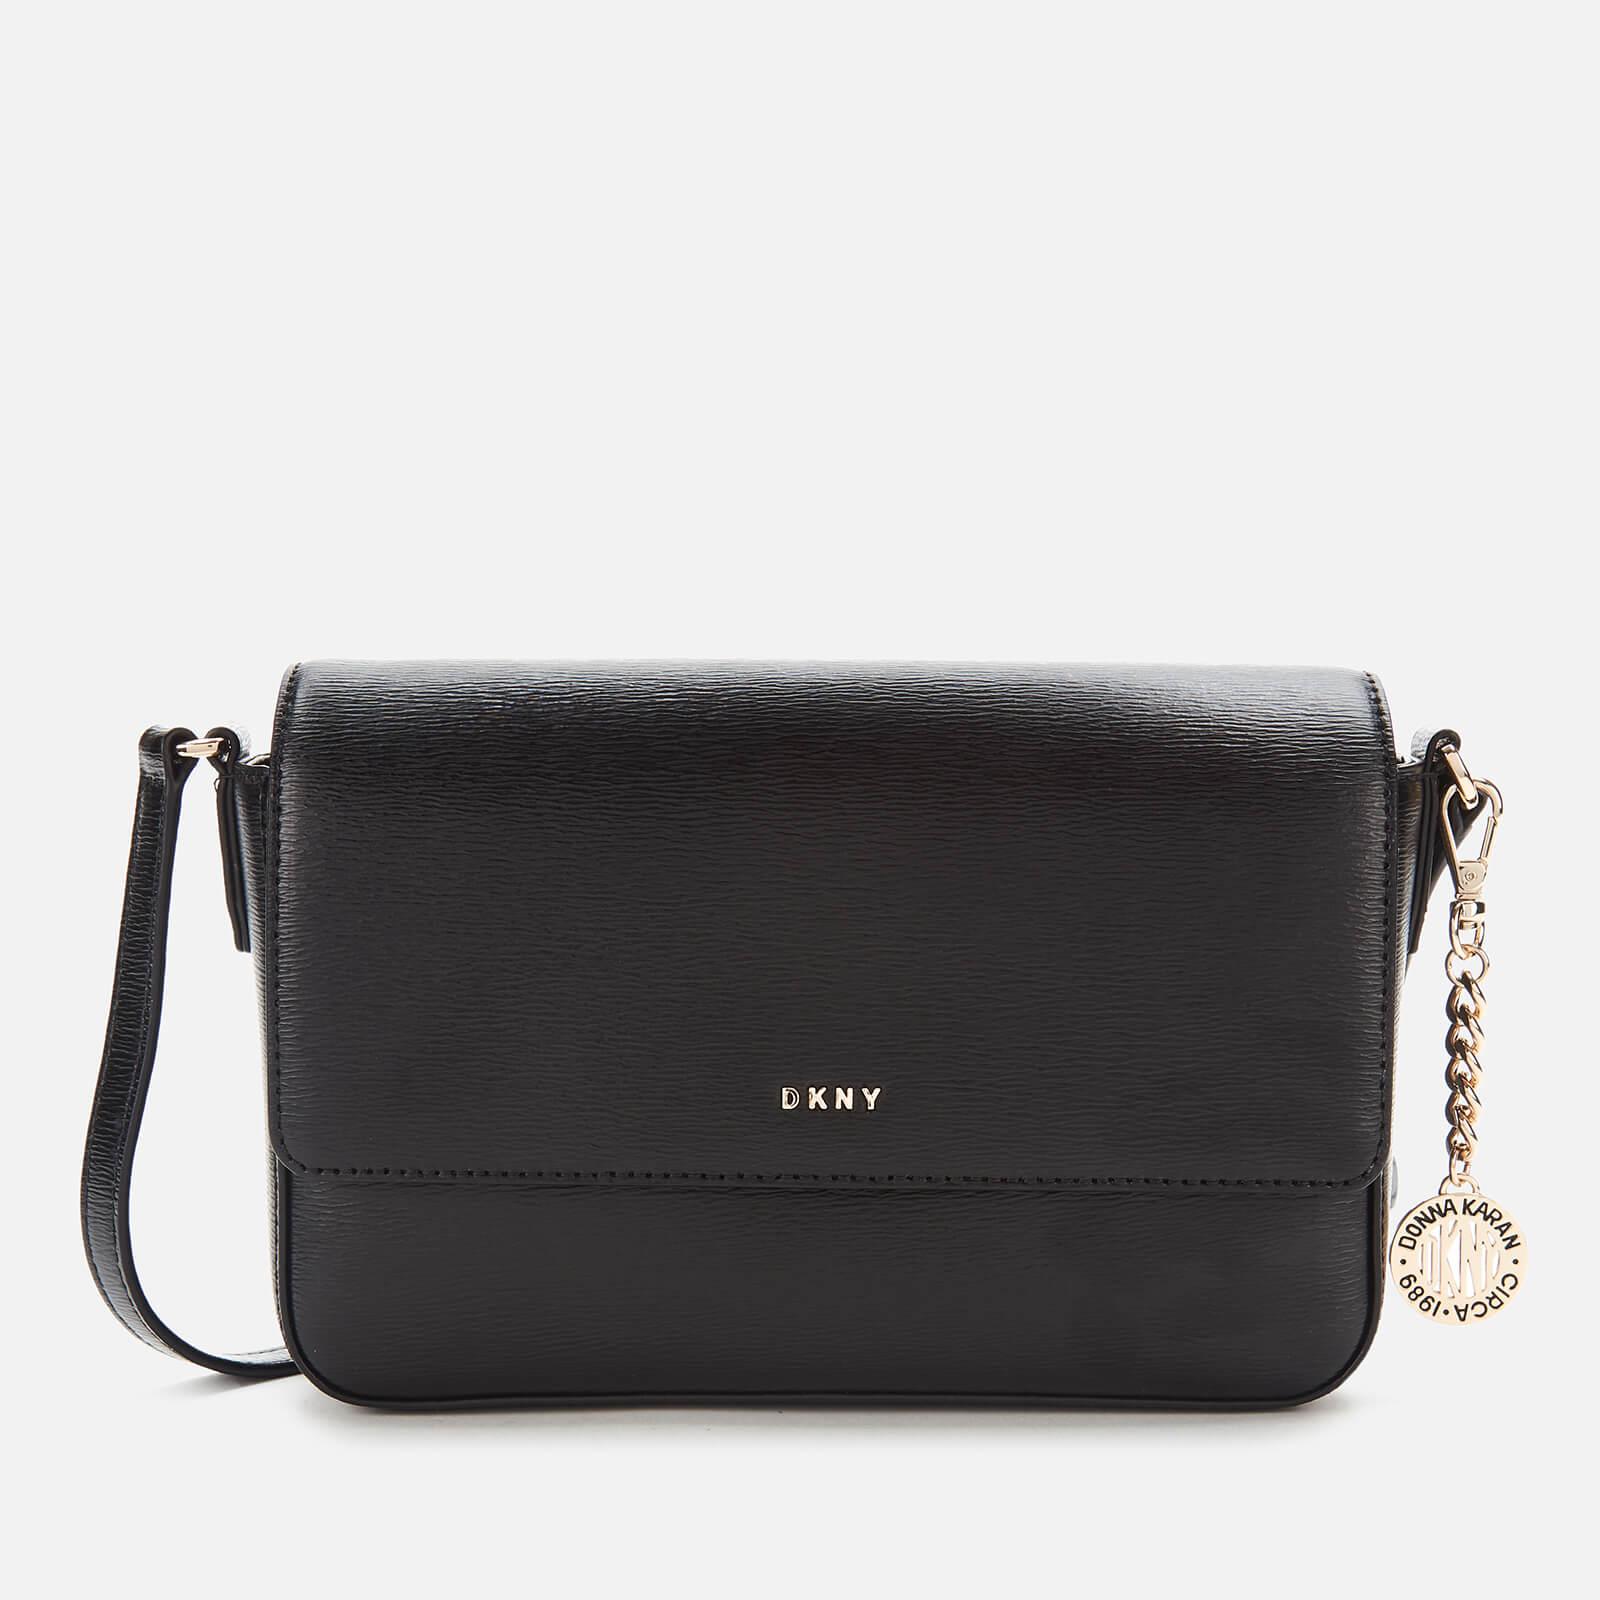 DKNY Women's Bryant Medium Flap Sutton Cross Body Bag - Black